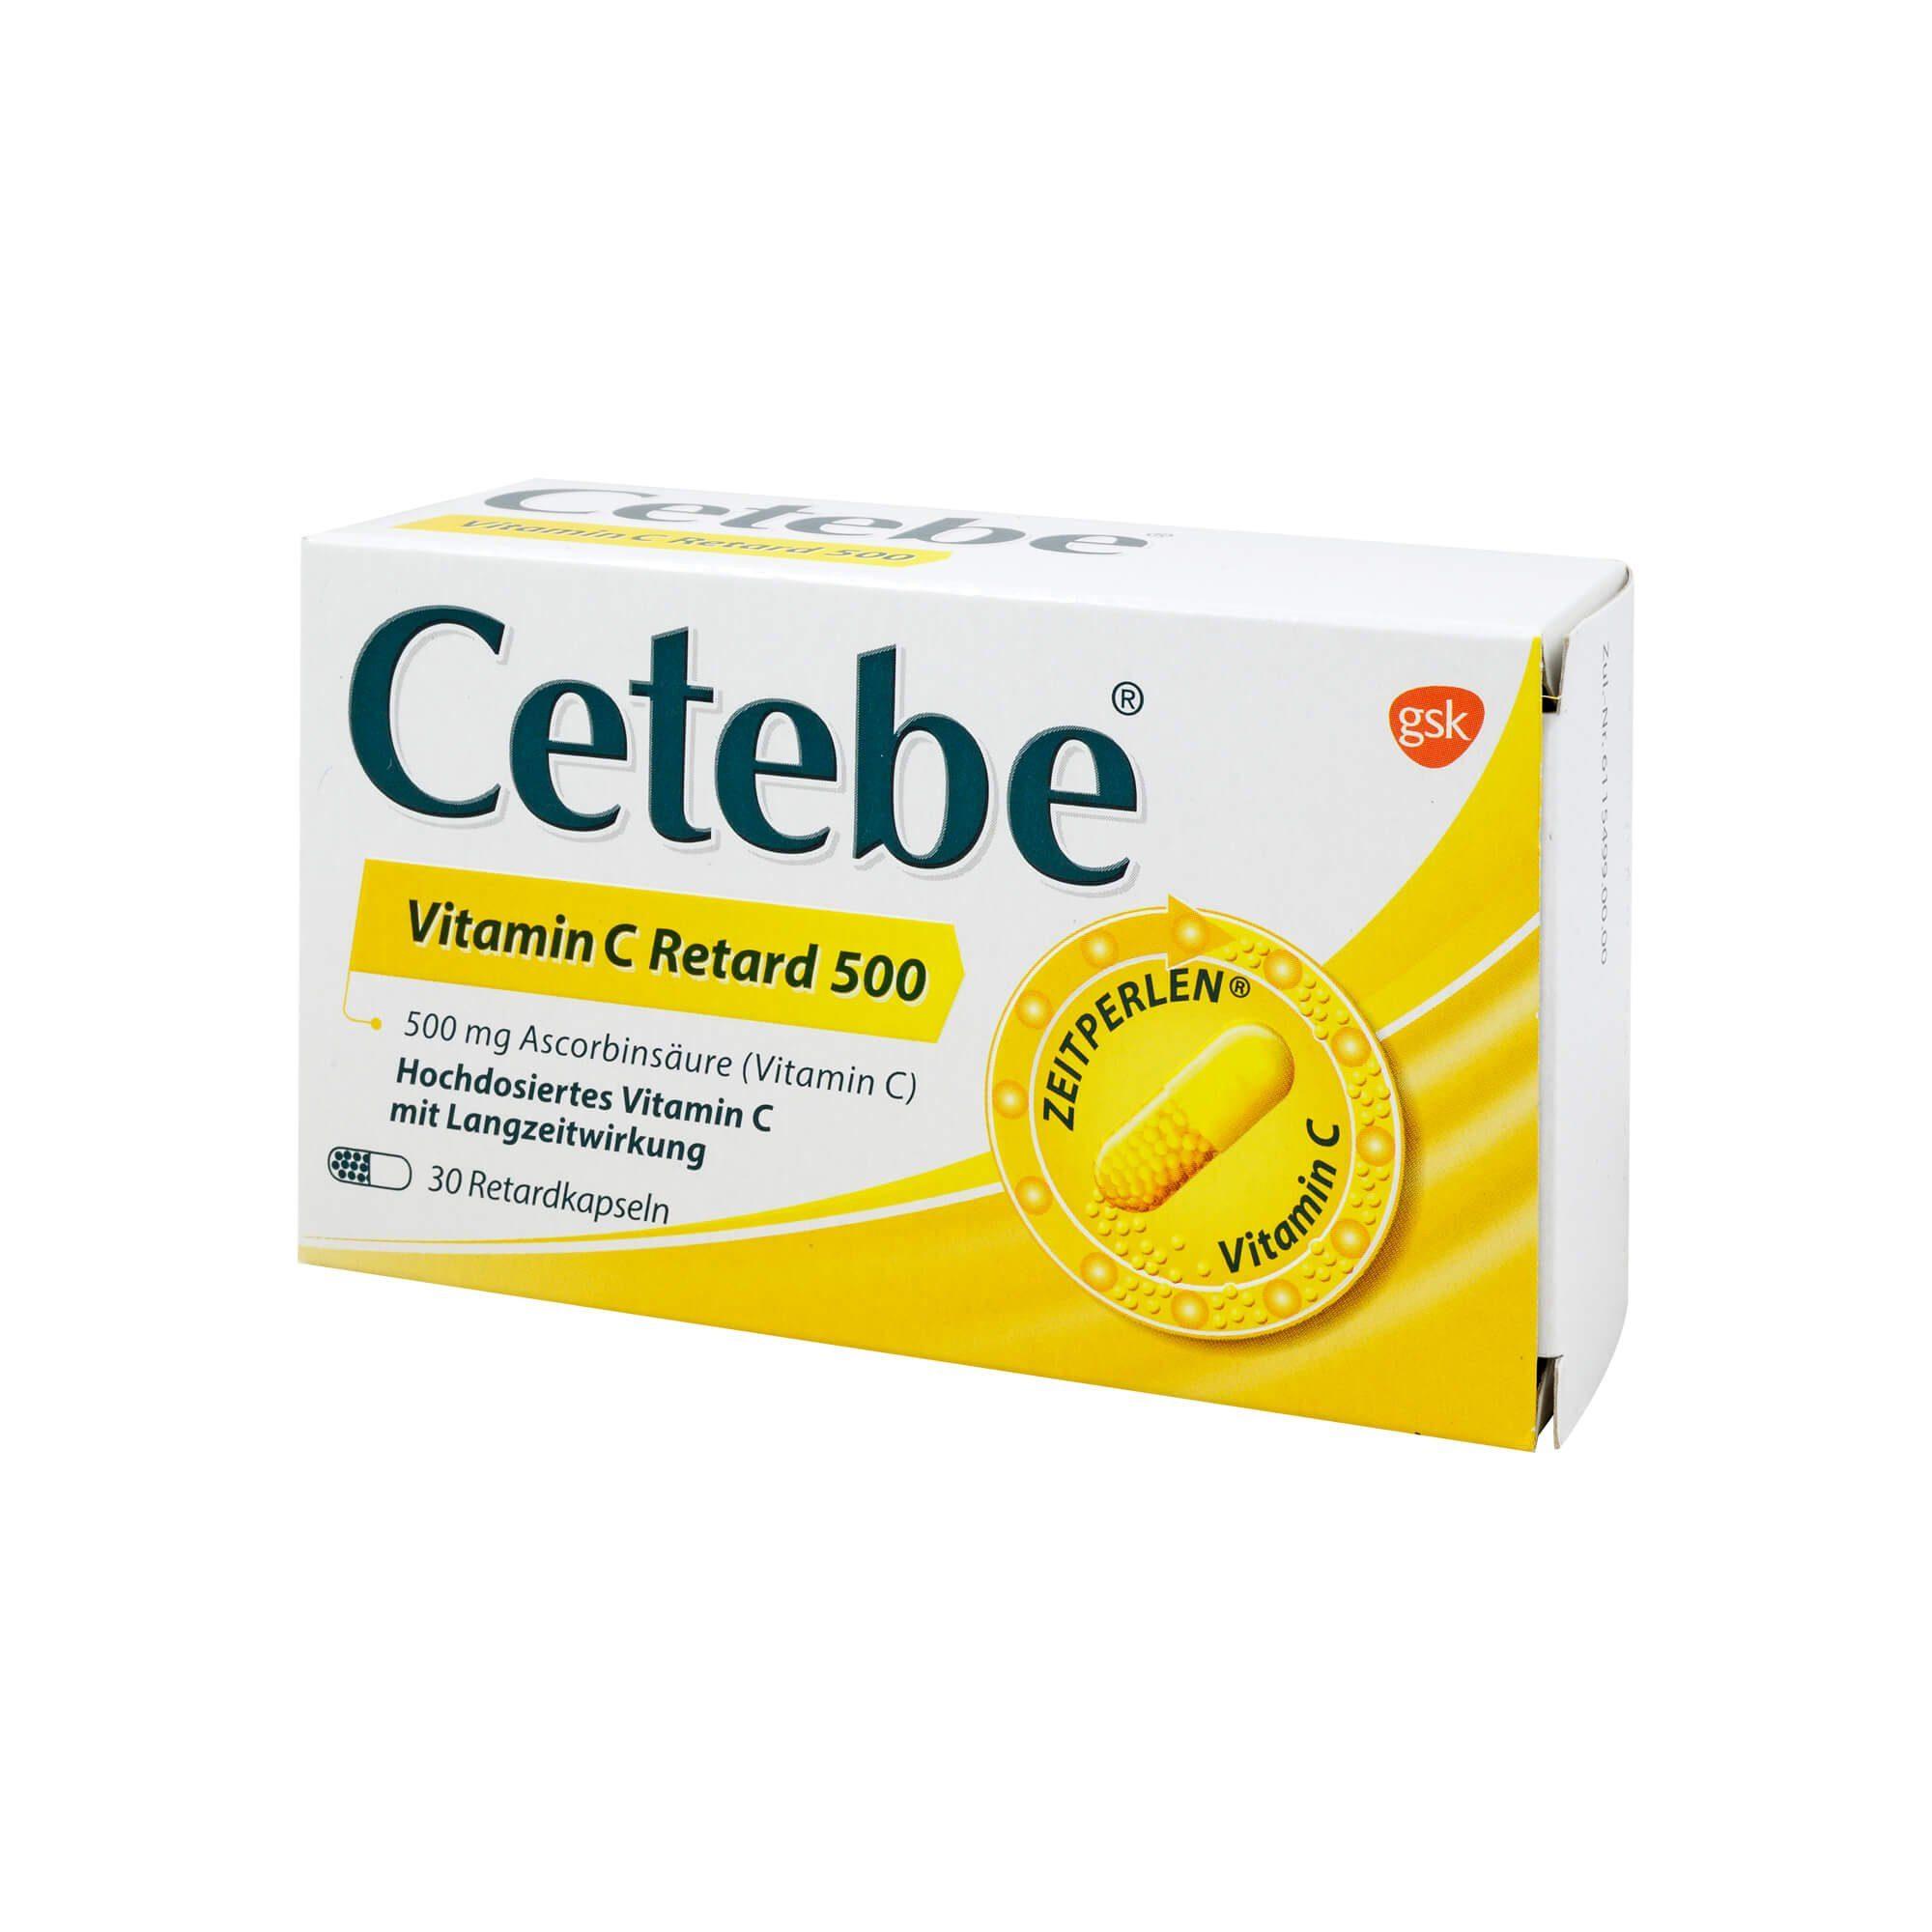 Cetebe Vitamin C Retard 500, 30 St